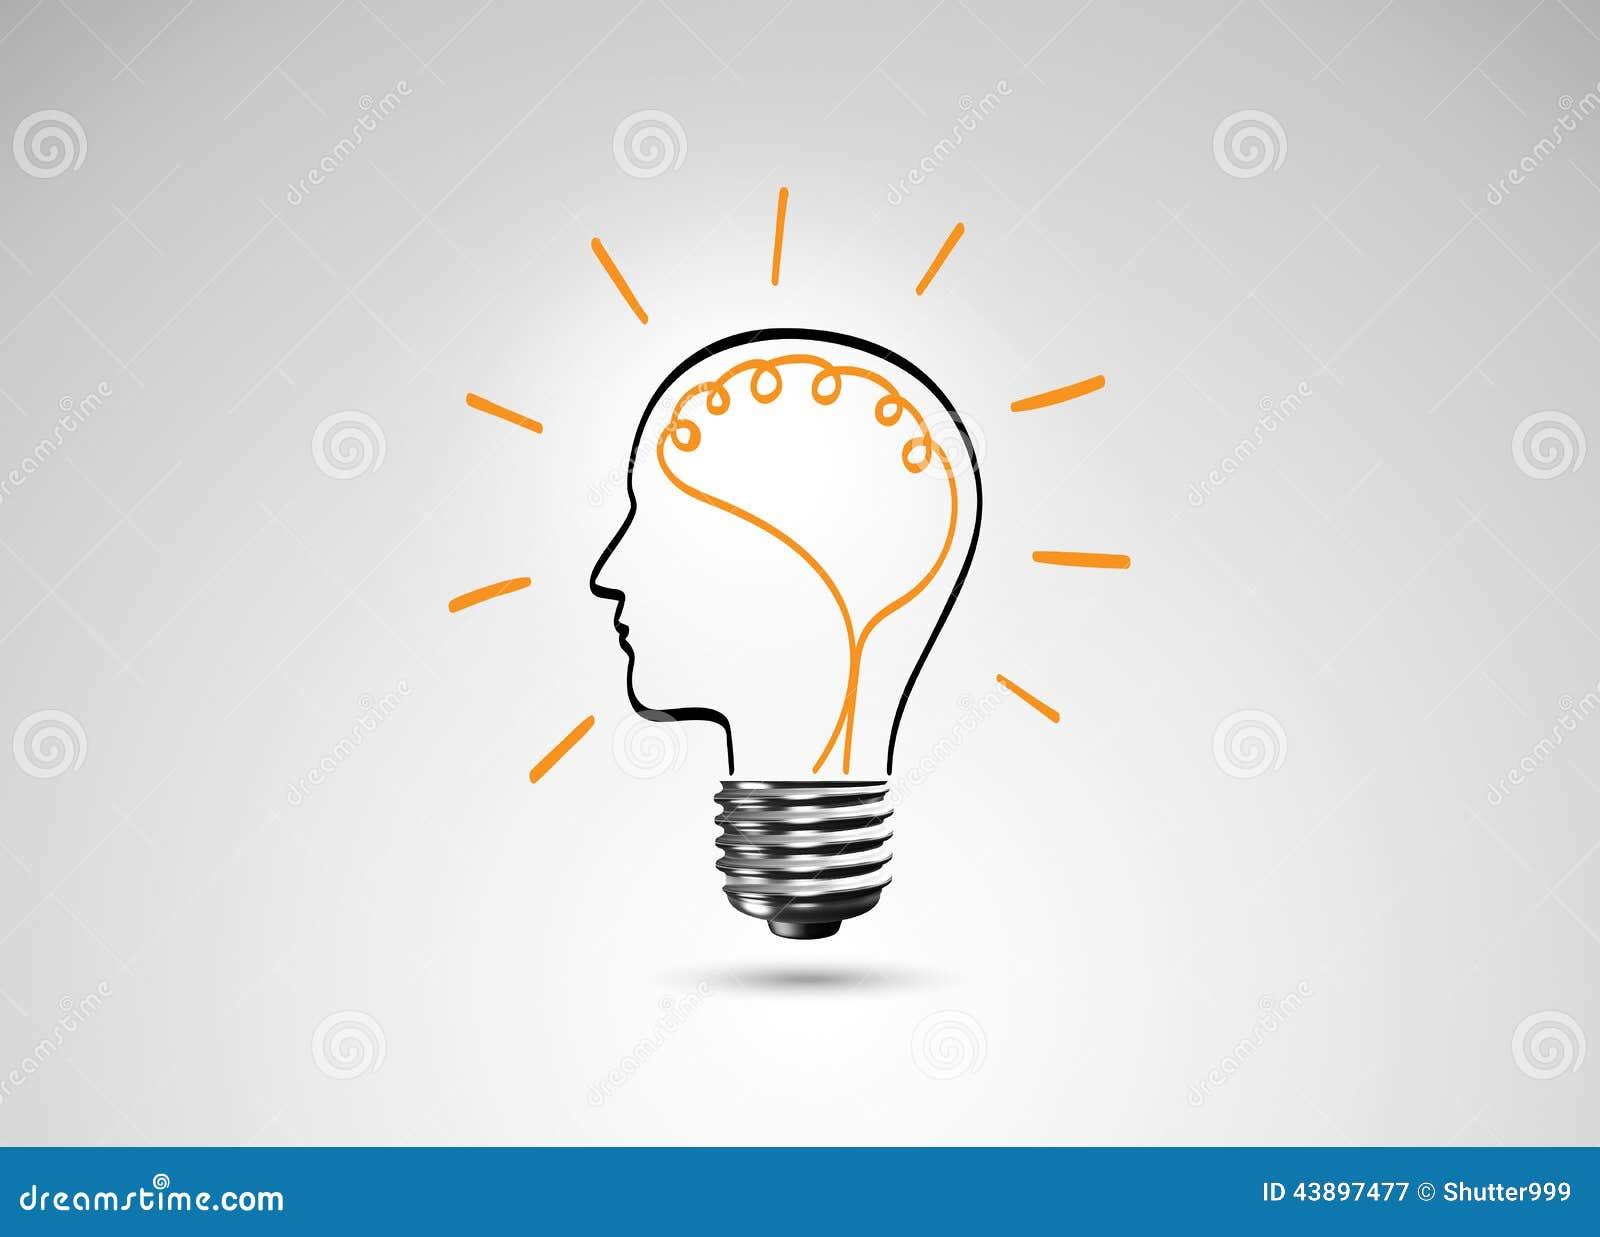 Light Bulb Metaphor For Good Idea Stock Photo Image 43897477